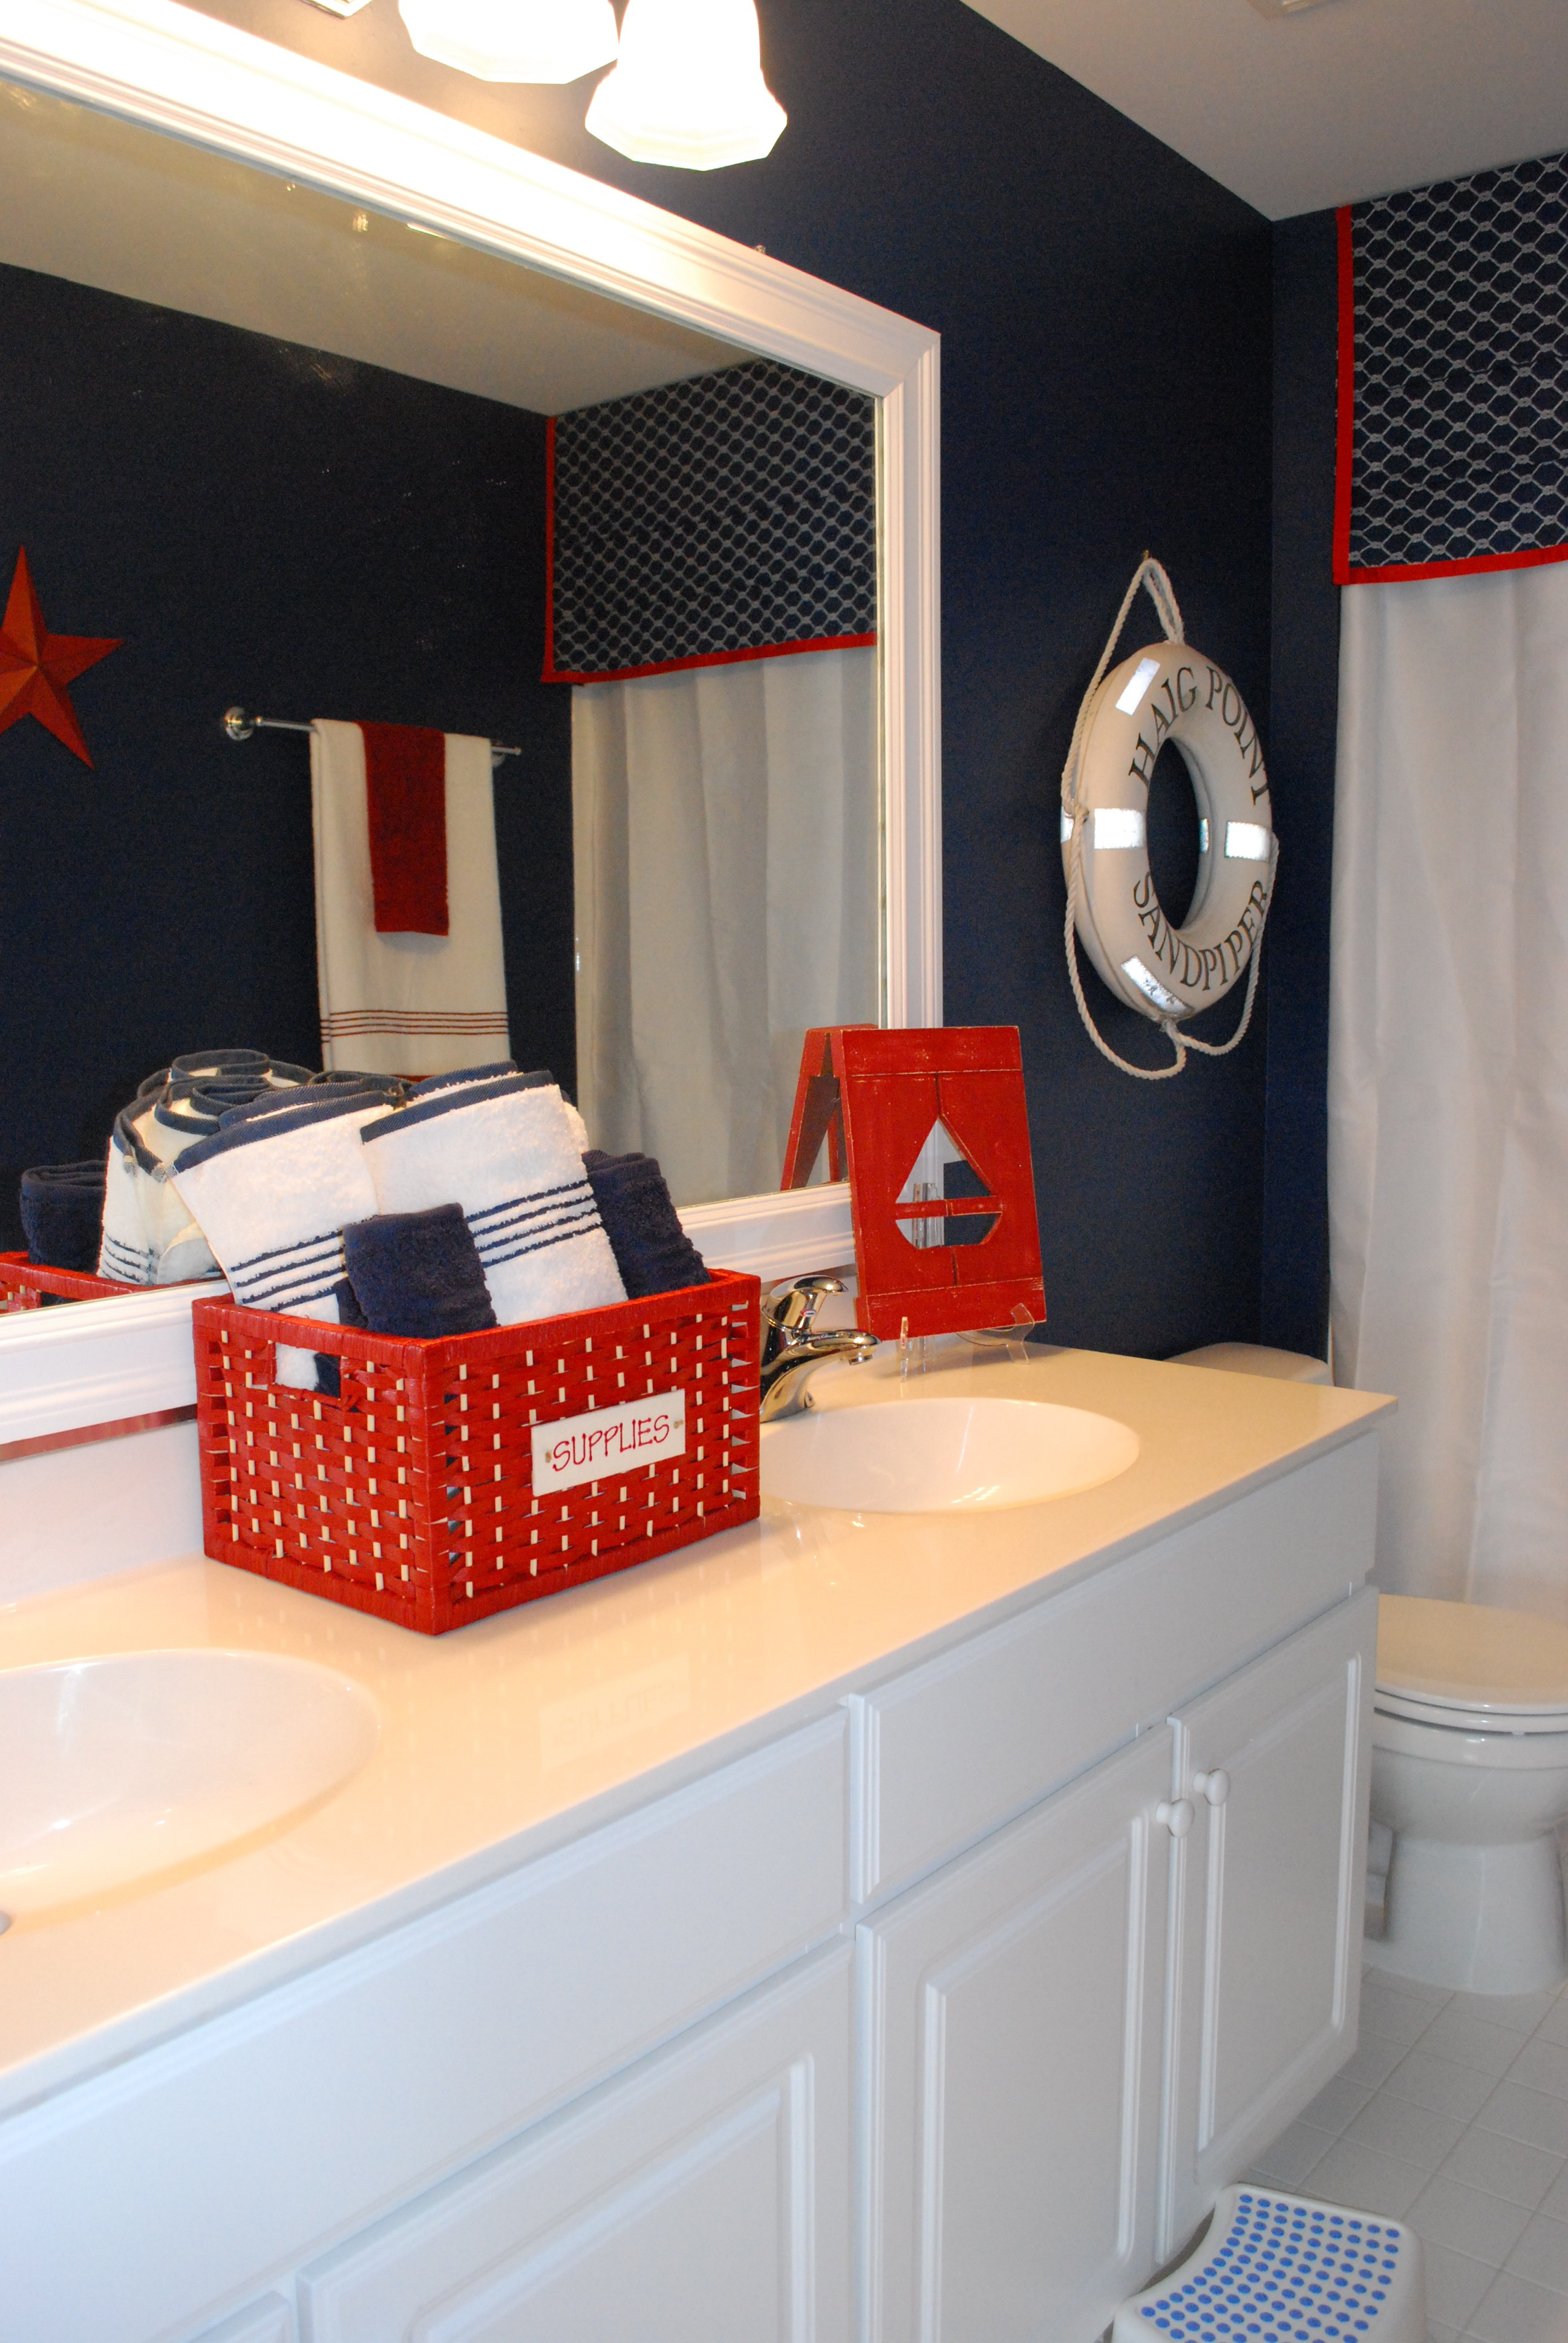 cute walmart bathroom accessories gallery-Cute Walmart Bathroom Accessories Design